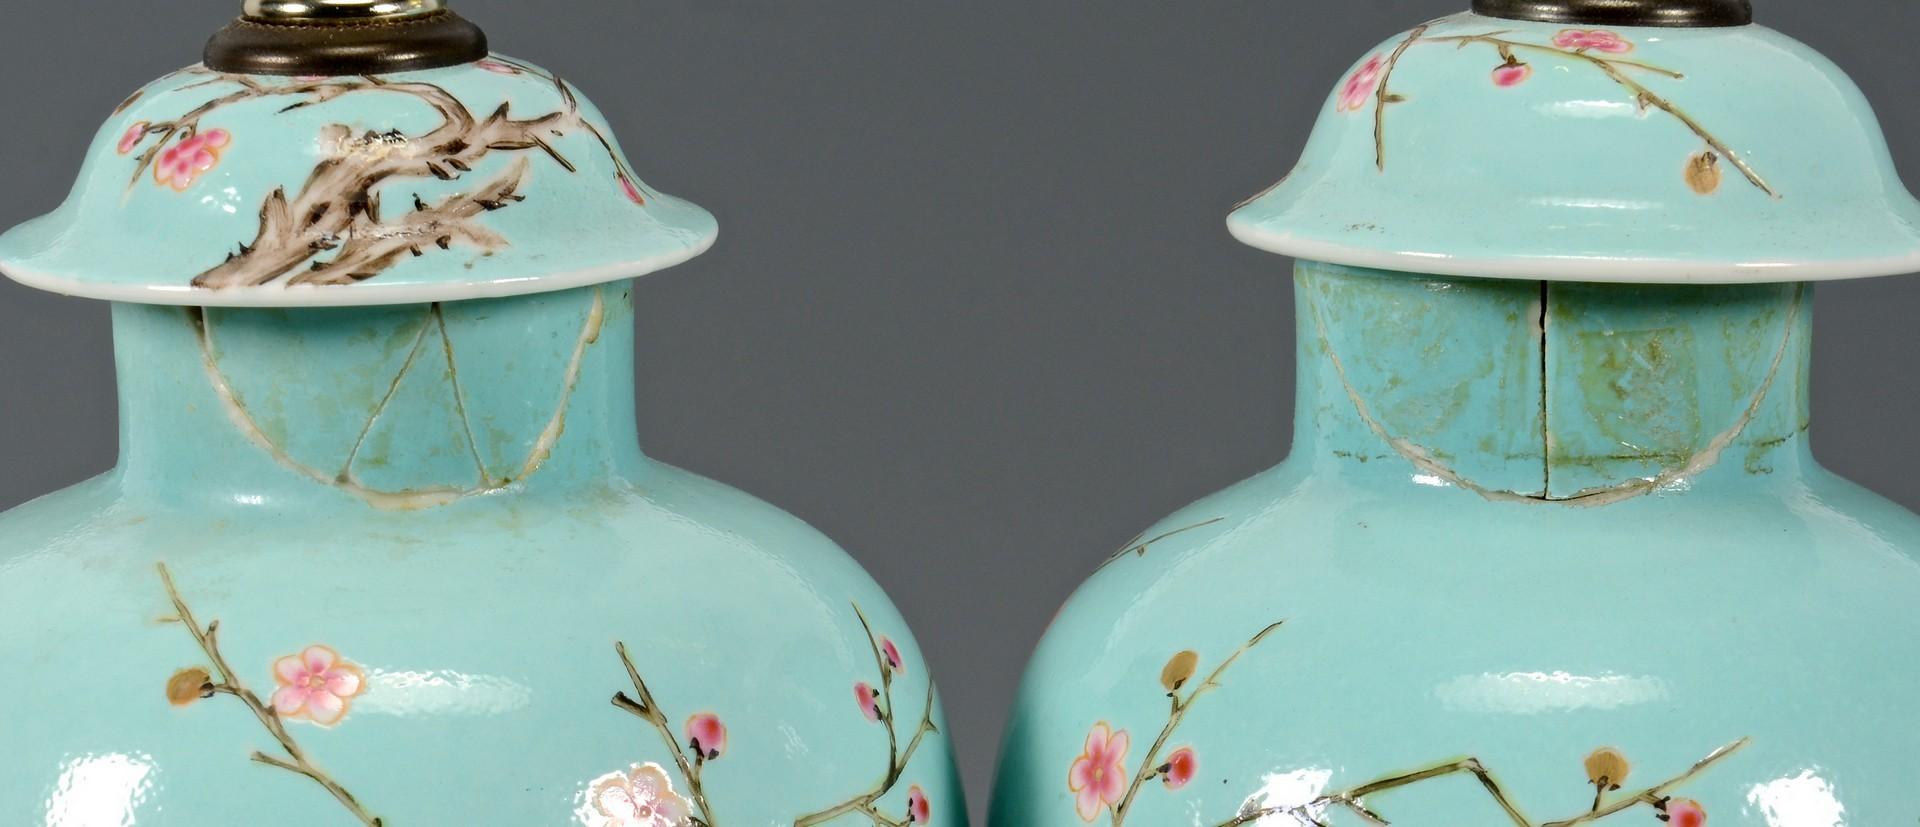 Lot 414: 2 Pair of Lamps, Prunus & Turquoise